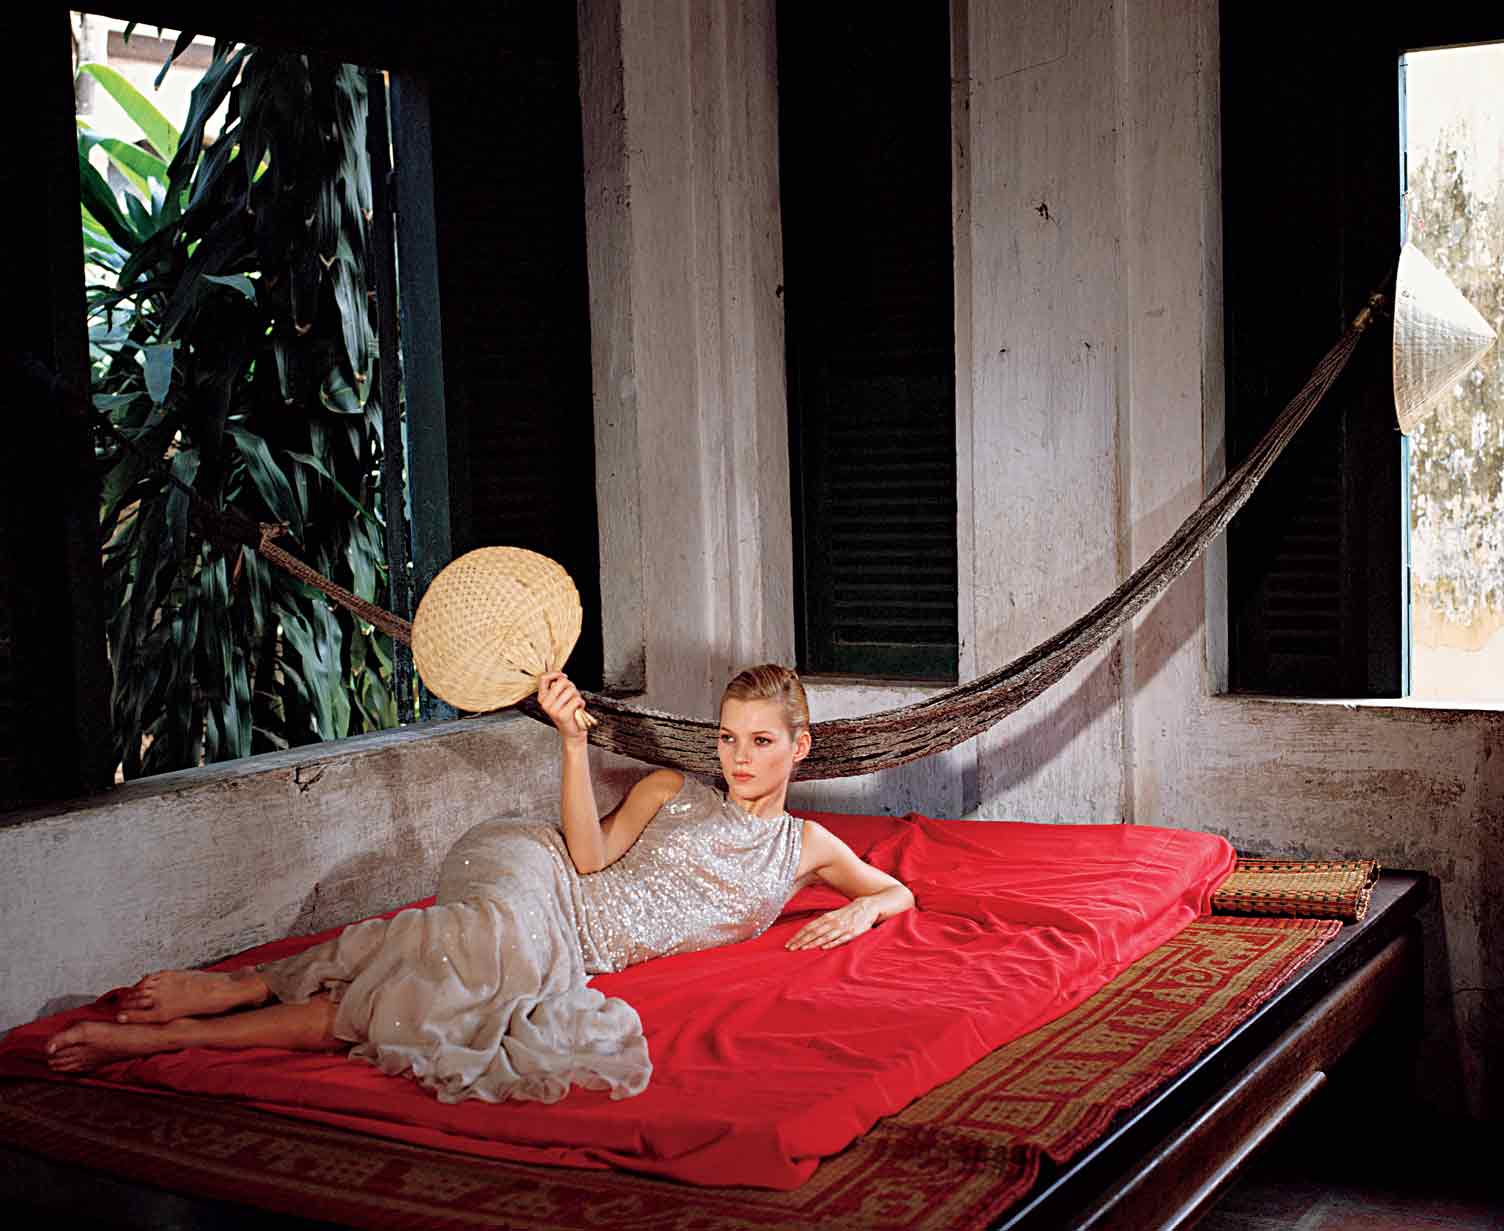 Kate Moss in an Oscar de la Renta bias-cutsilk chiffon dress, 1996. Bruce Weber /Vogue,  © Condé Nast